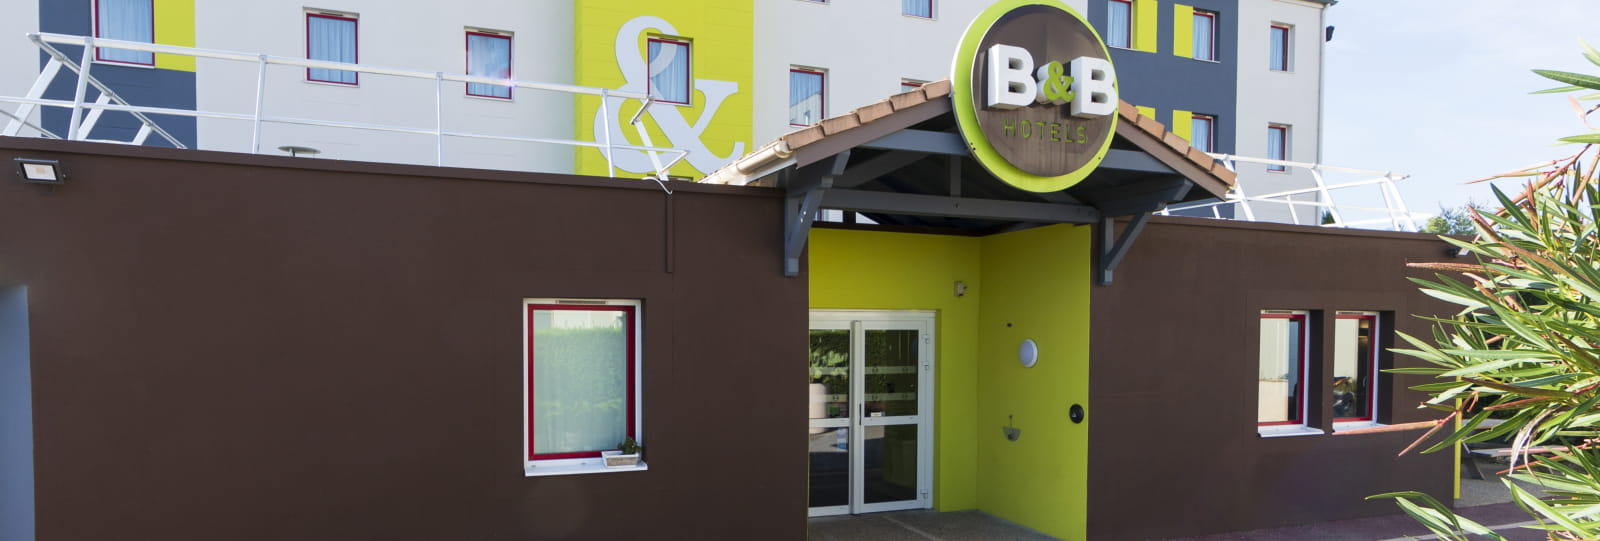 Hôtel B&B Valence Sud